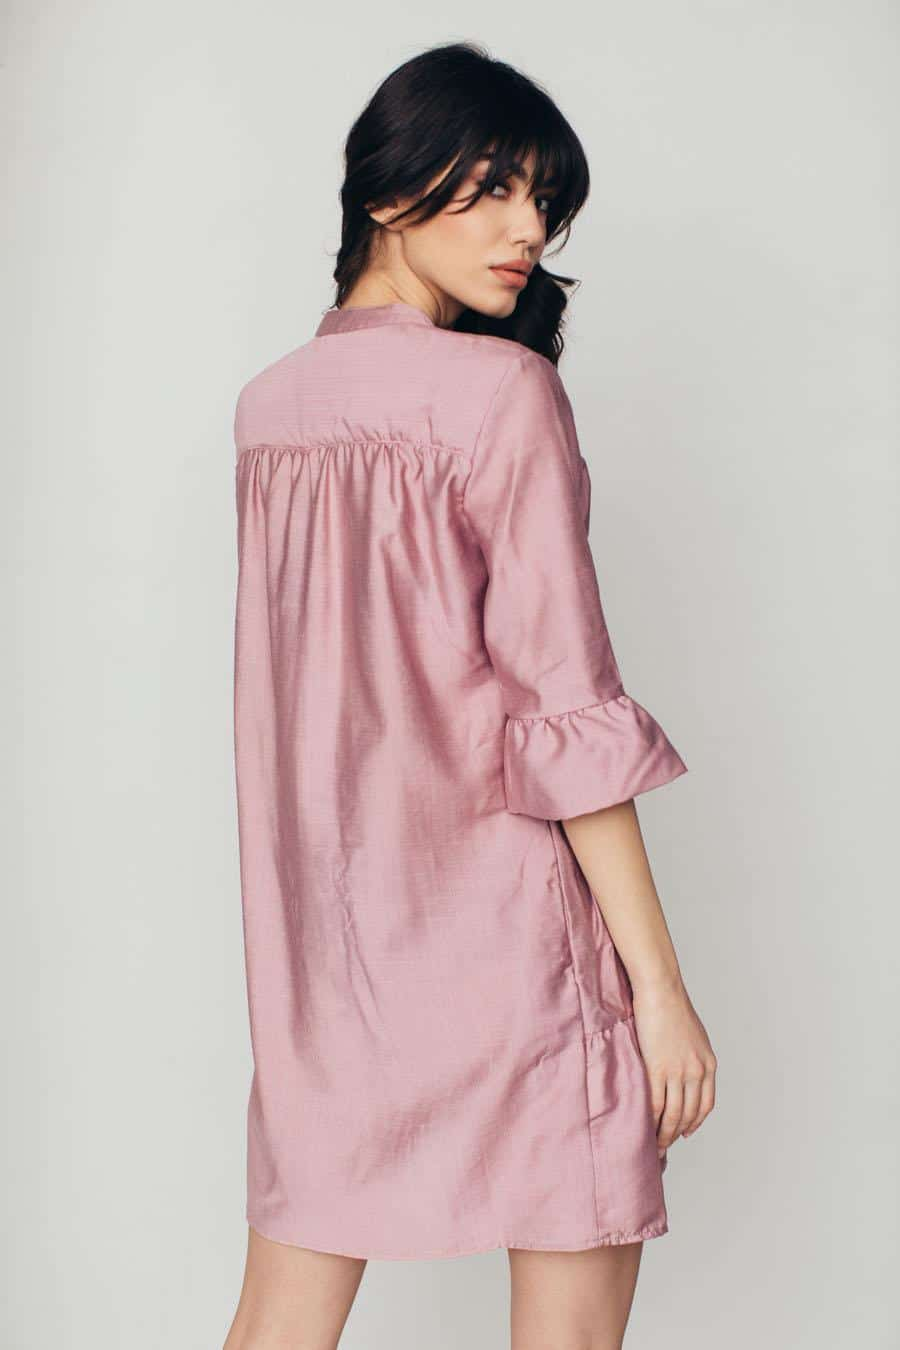 jagger zenska haljina kolekcija prolece leto 2021 ss 2021 kupi online jg 5505 10 01